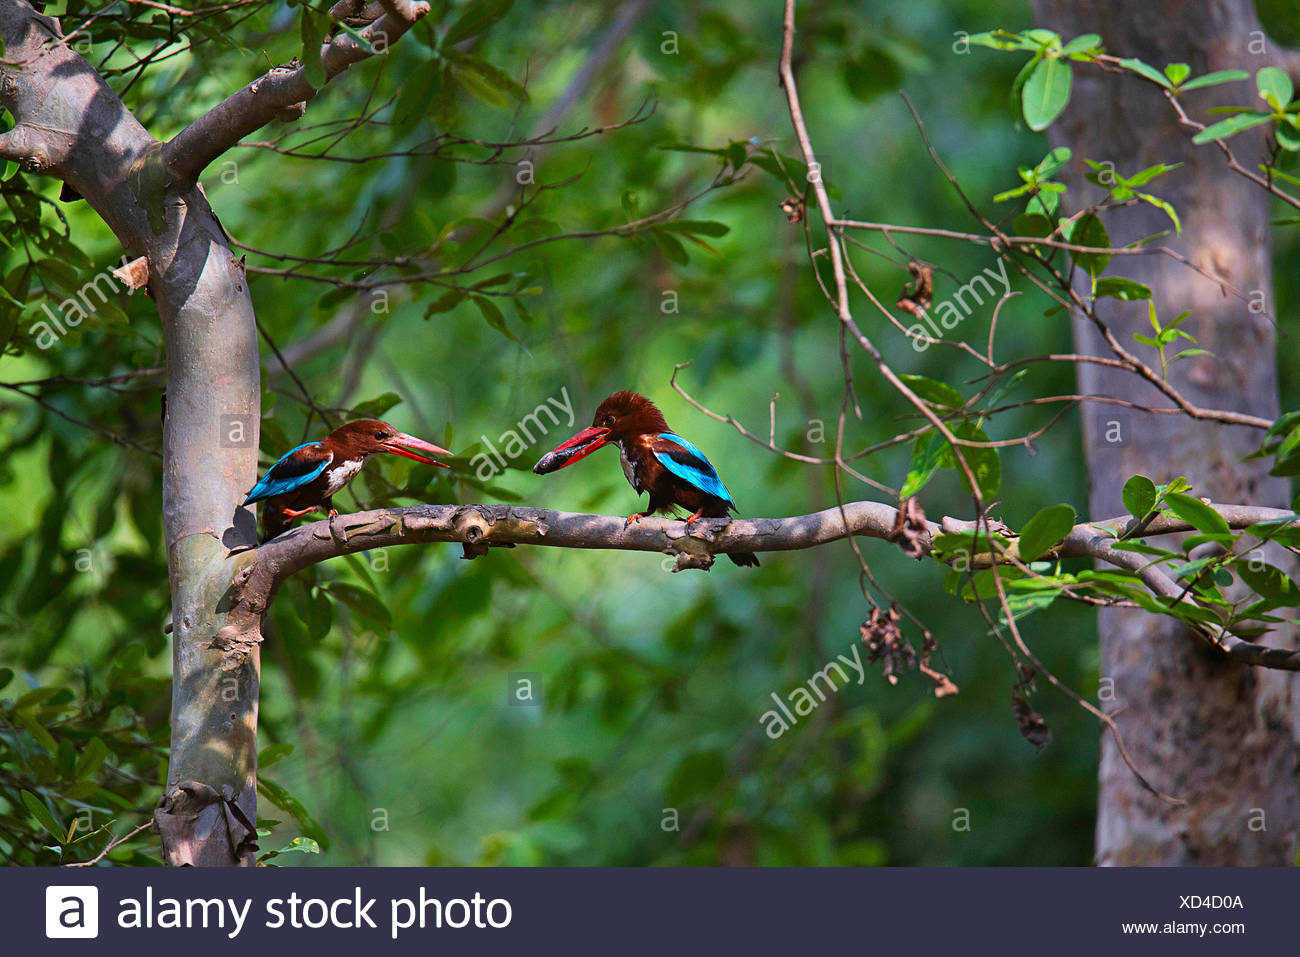 White throated Kingfisher pair, Halcyon smyrnensis, Panna Tiger Reserve, Madhya Pradesh - Stock Image